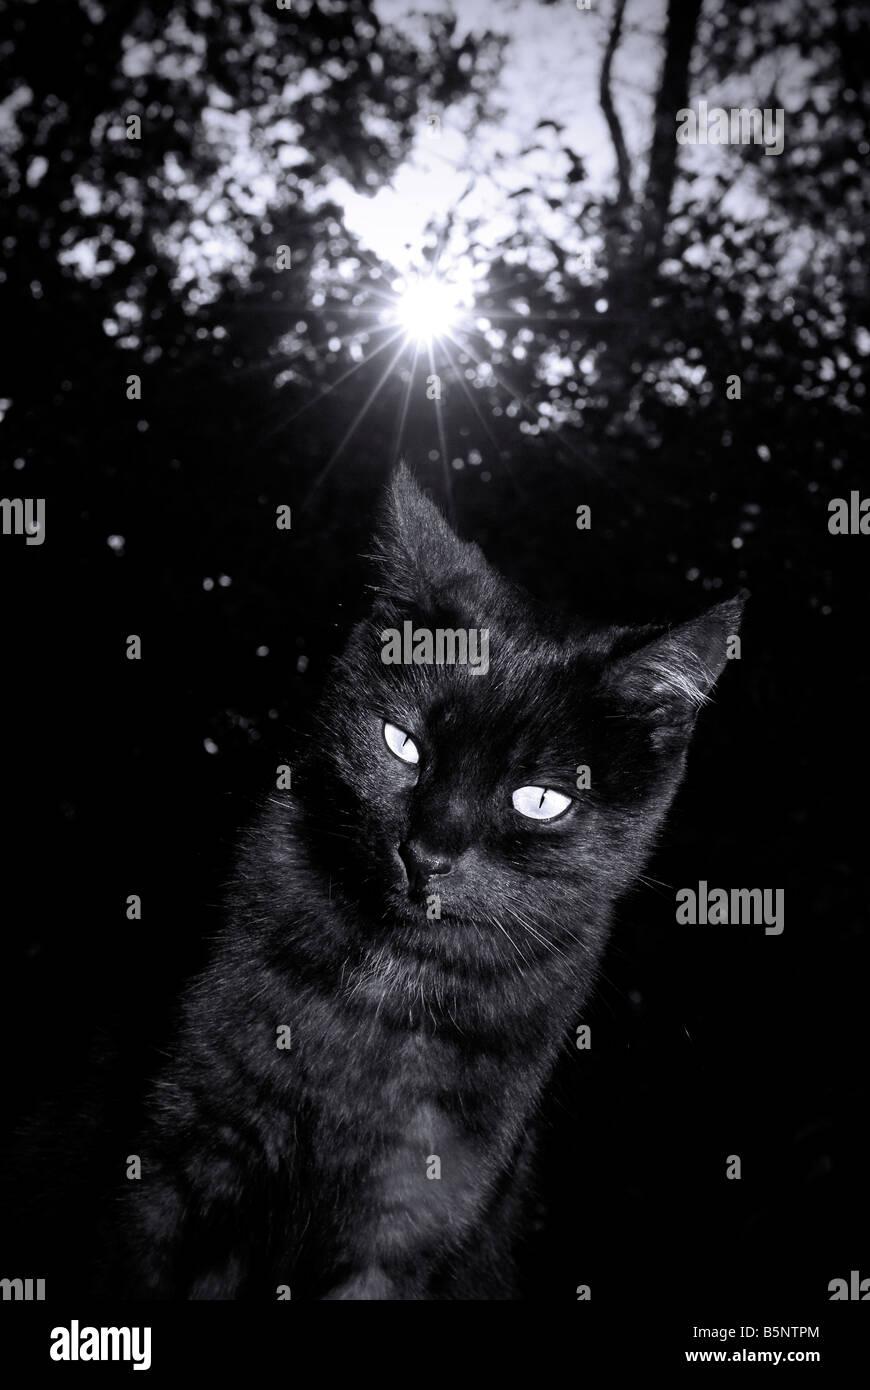 Black cat at sunset - Stock Image